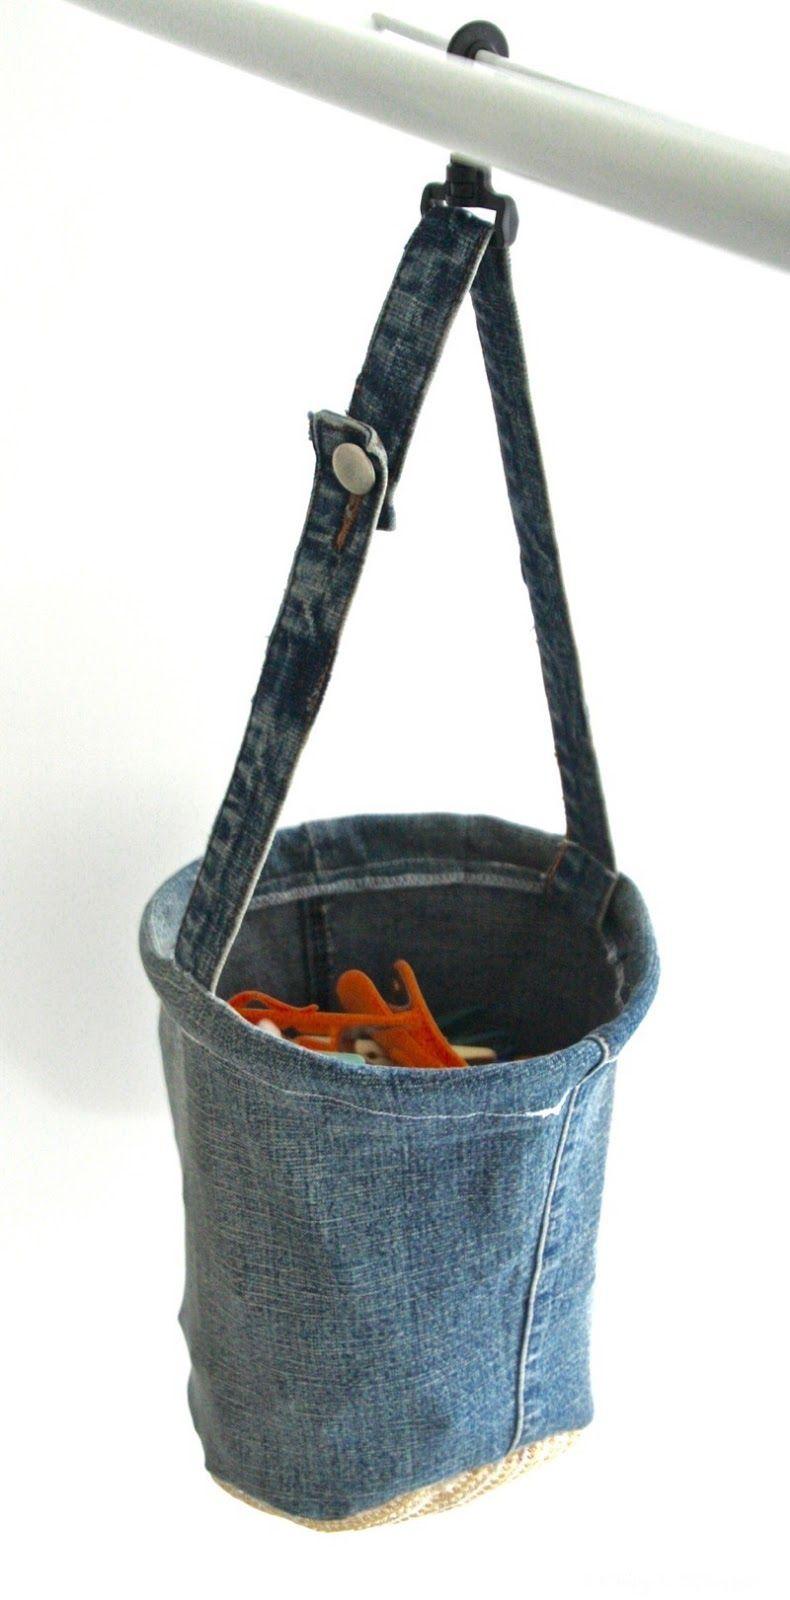 Denim Peg Bag - I originally found this great project on freeneedle ...